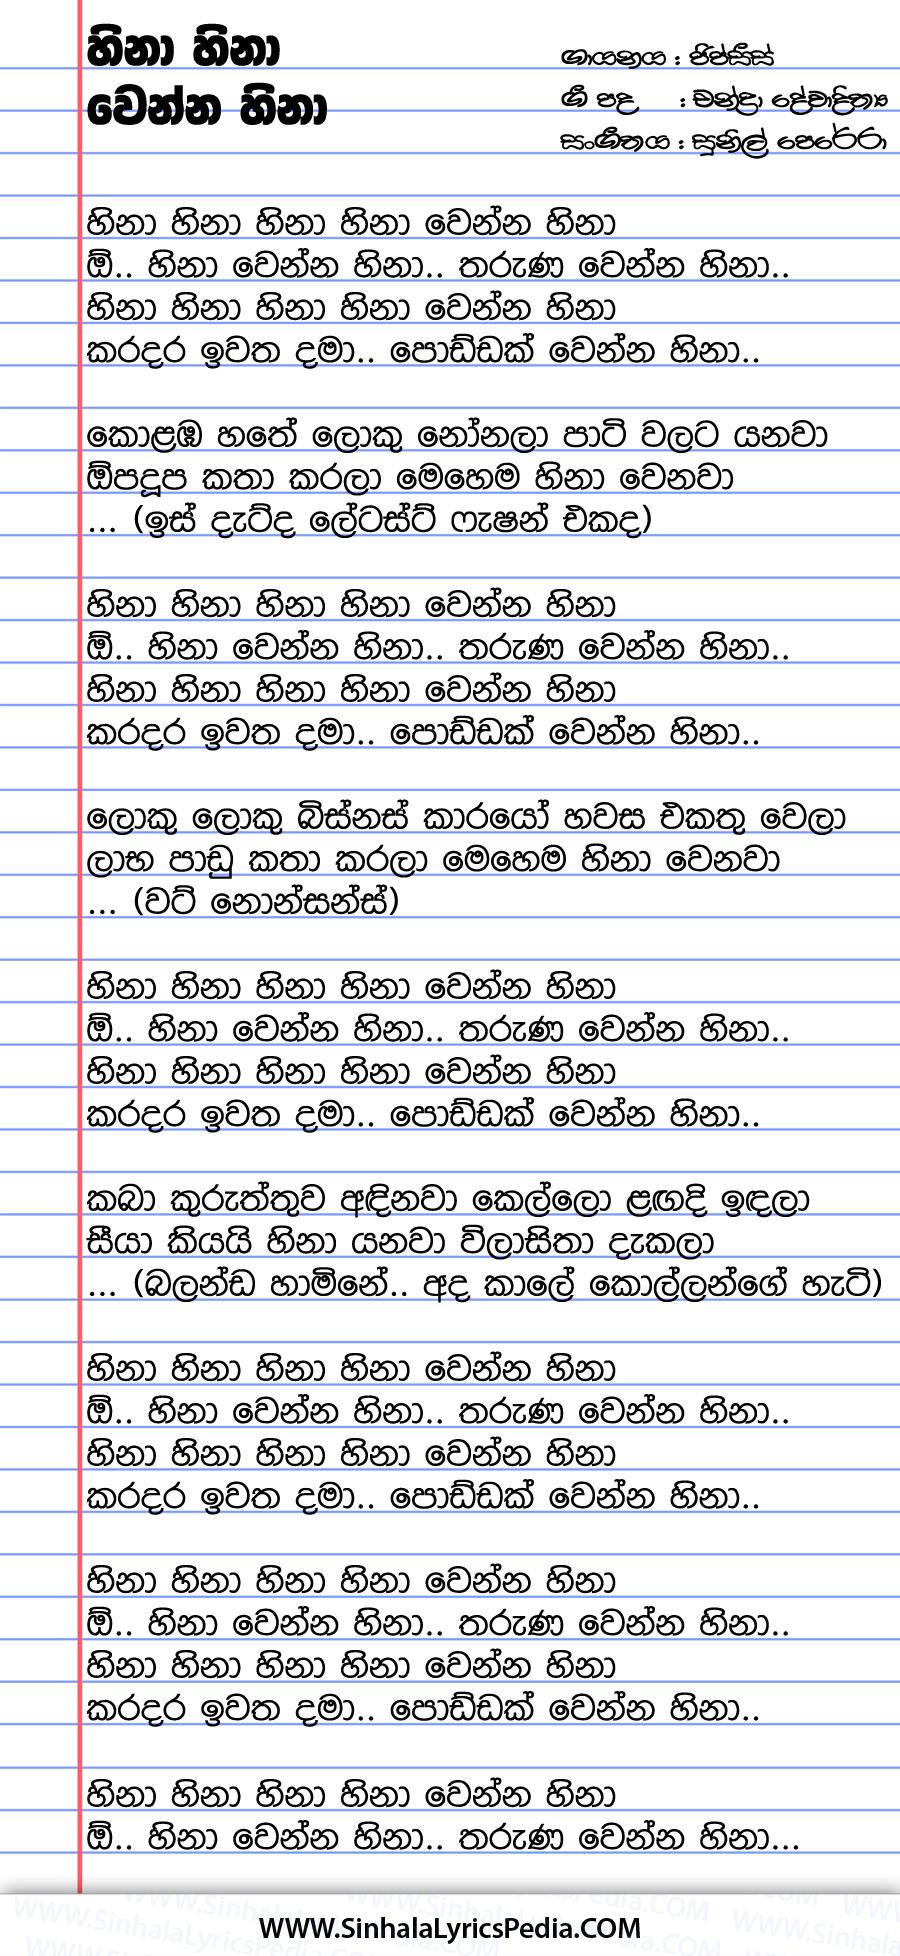 Hina Hina Wenna Hina Song Lyrics